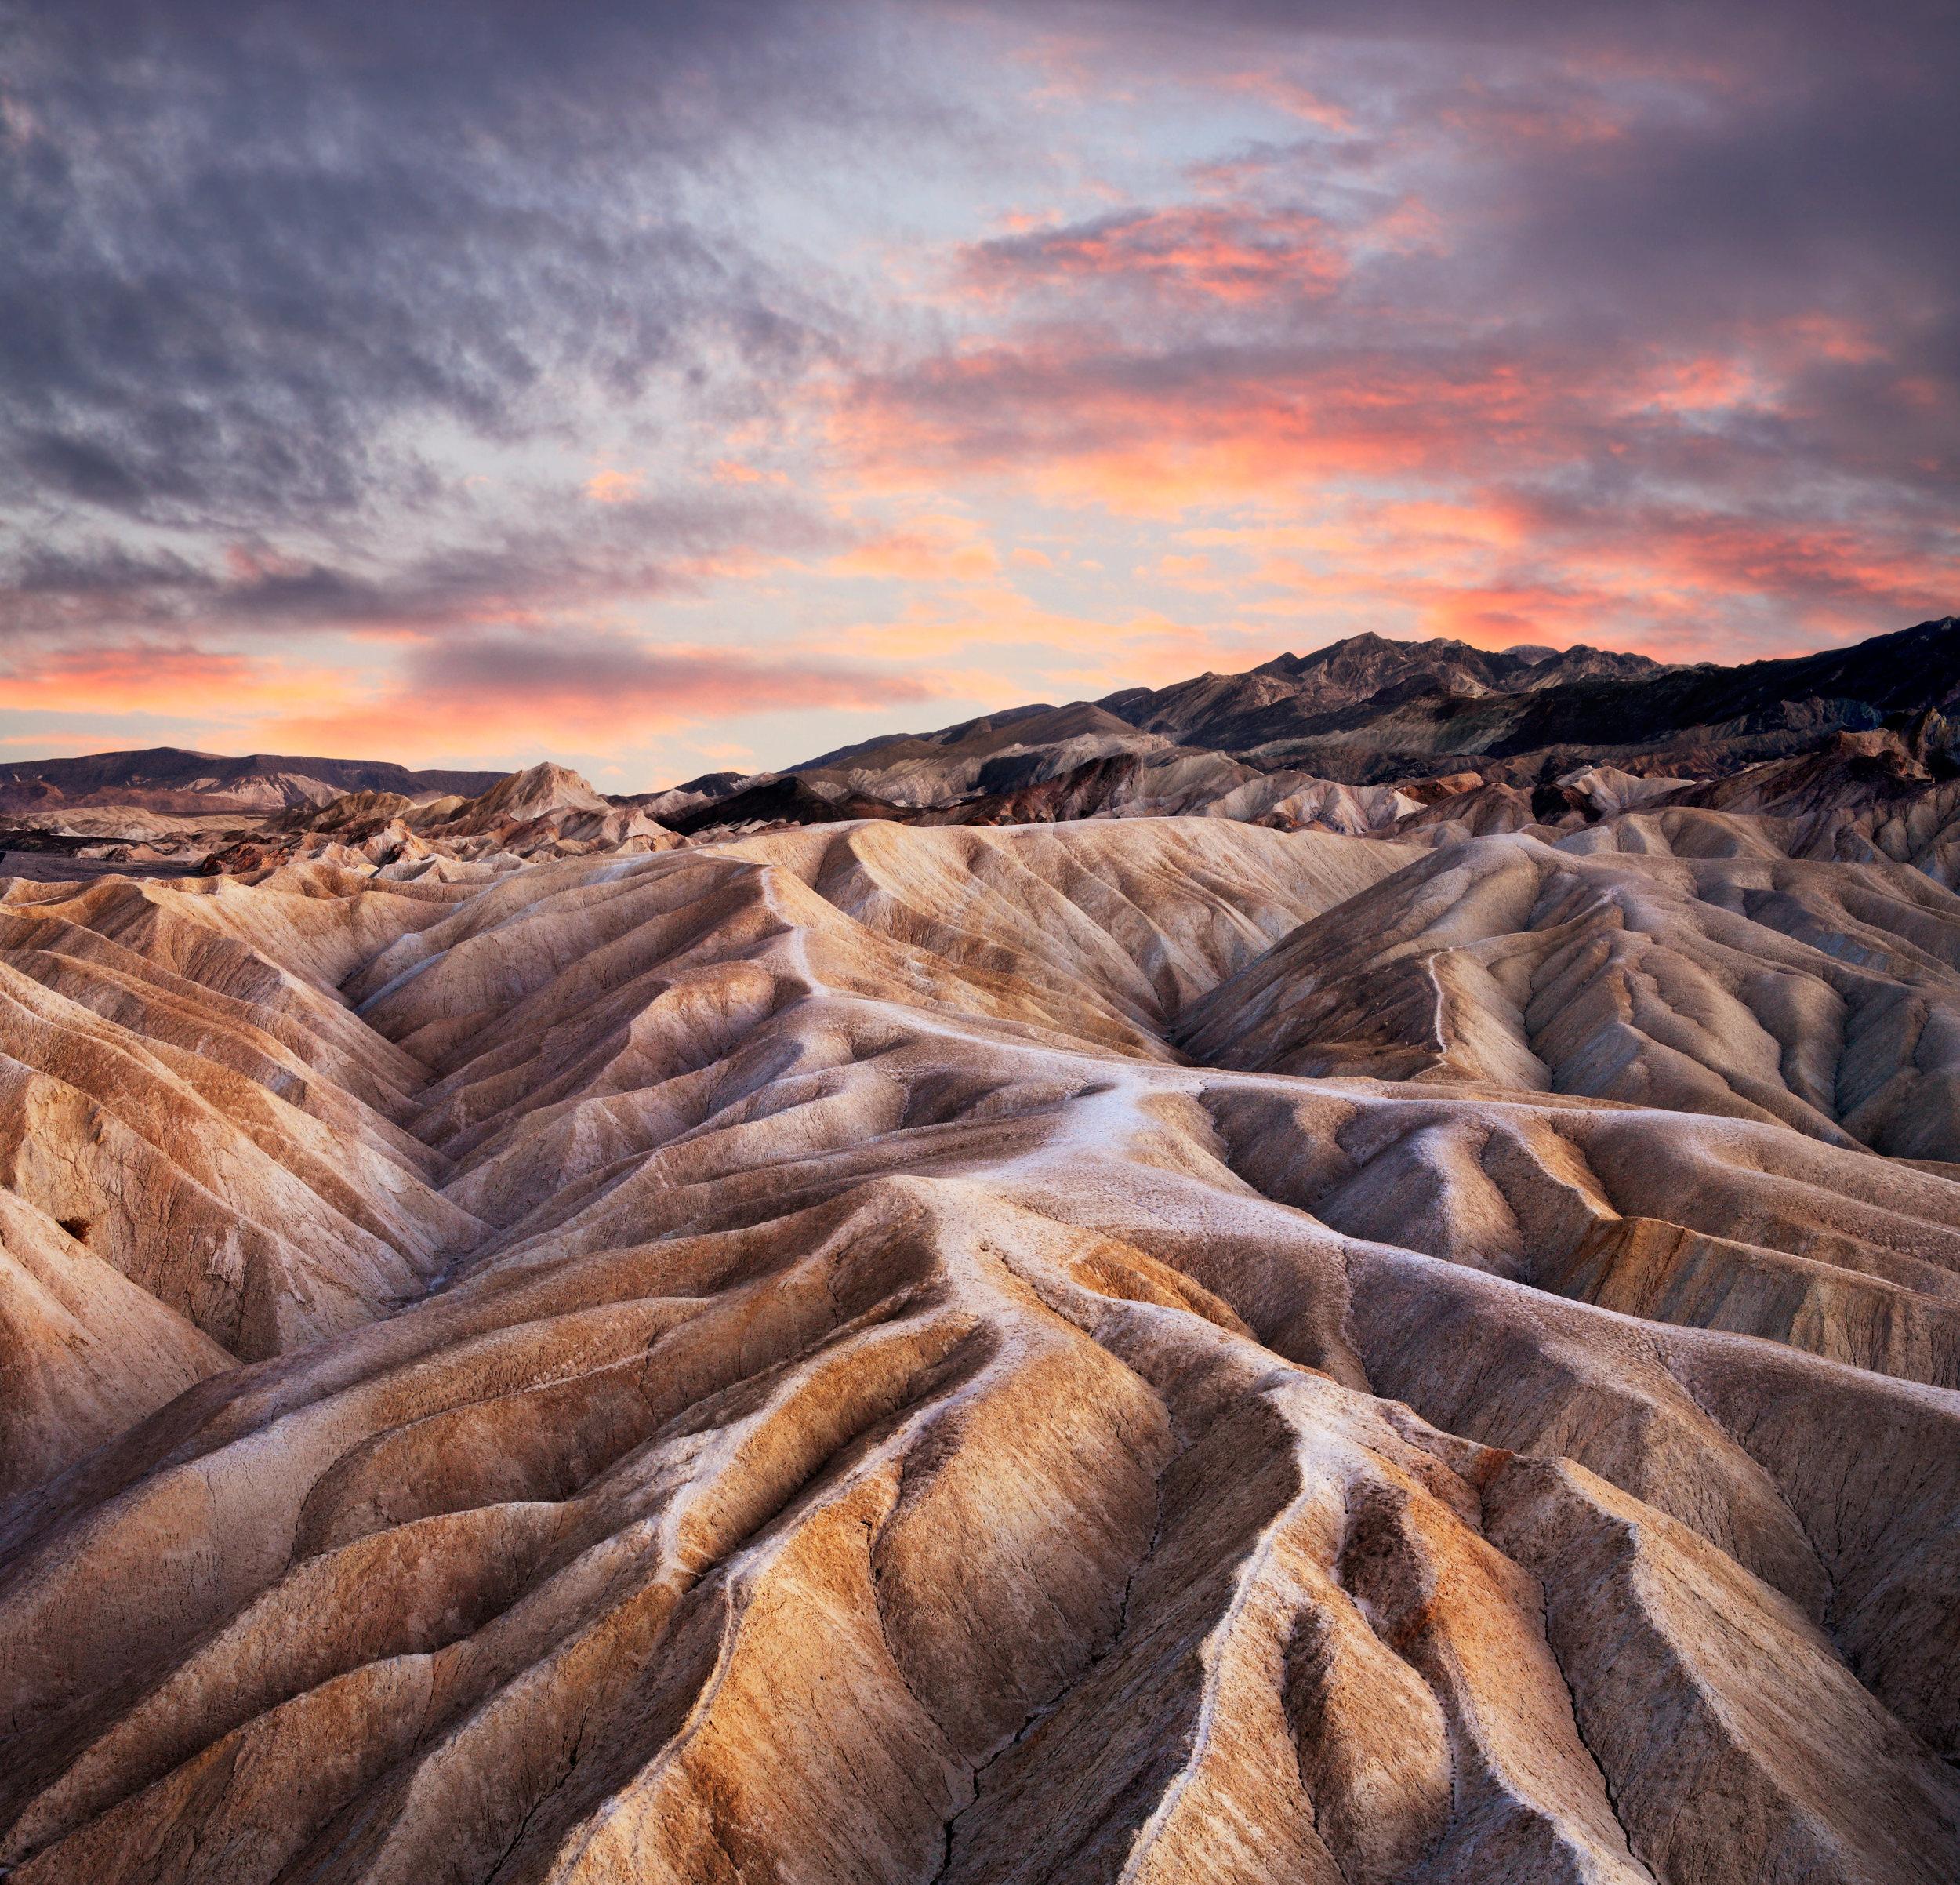 Heavily Eroded Ridges At Zabriskie Point - Death Valley National Park - California - (PHOTO: DOUG LEMKE/SHUTTERSTOCK)